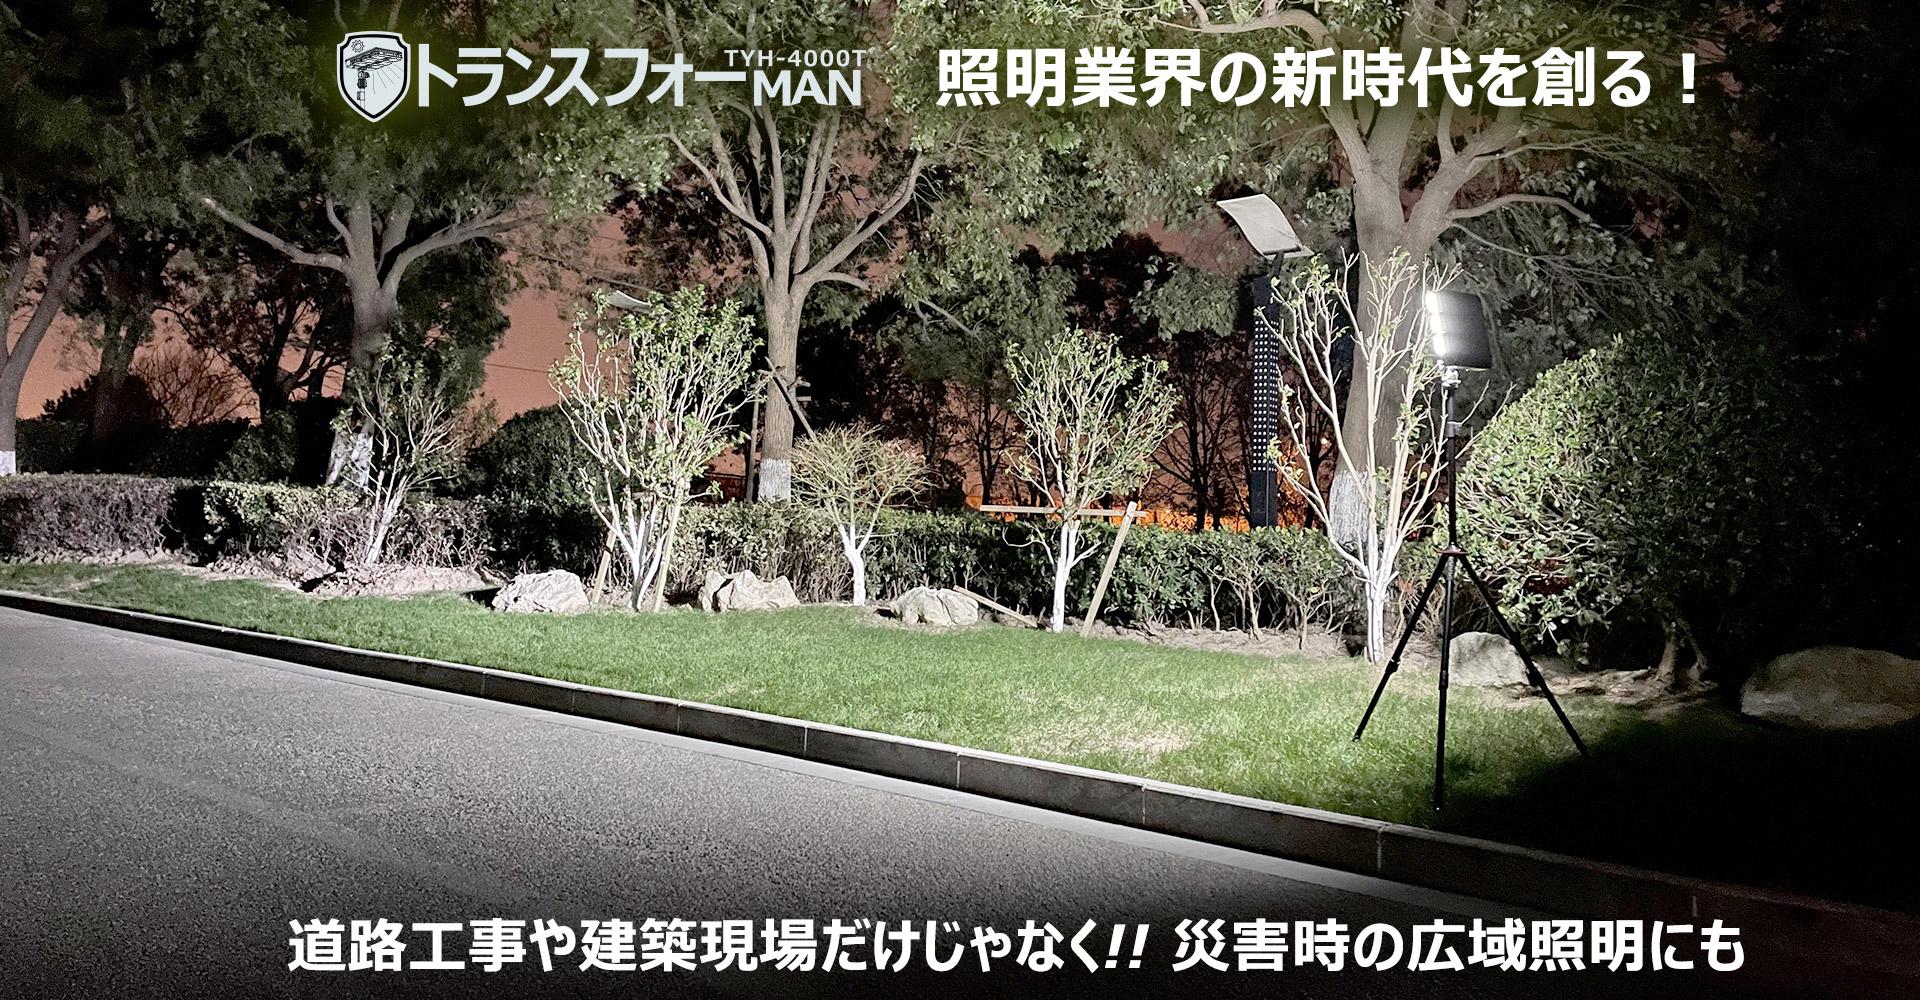 LED投光器 45W LEDソーラーライト 太陽光充電 三脚付き 屋外 ガーデンライト 防水 電池交換式 自動点灯 GOODGOODS